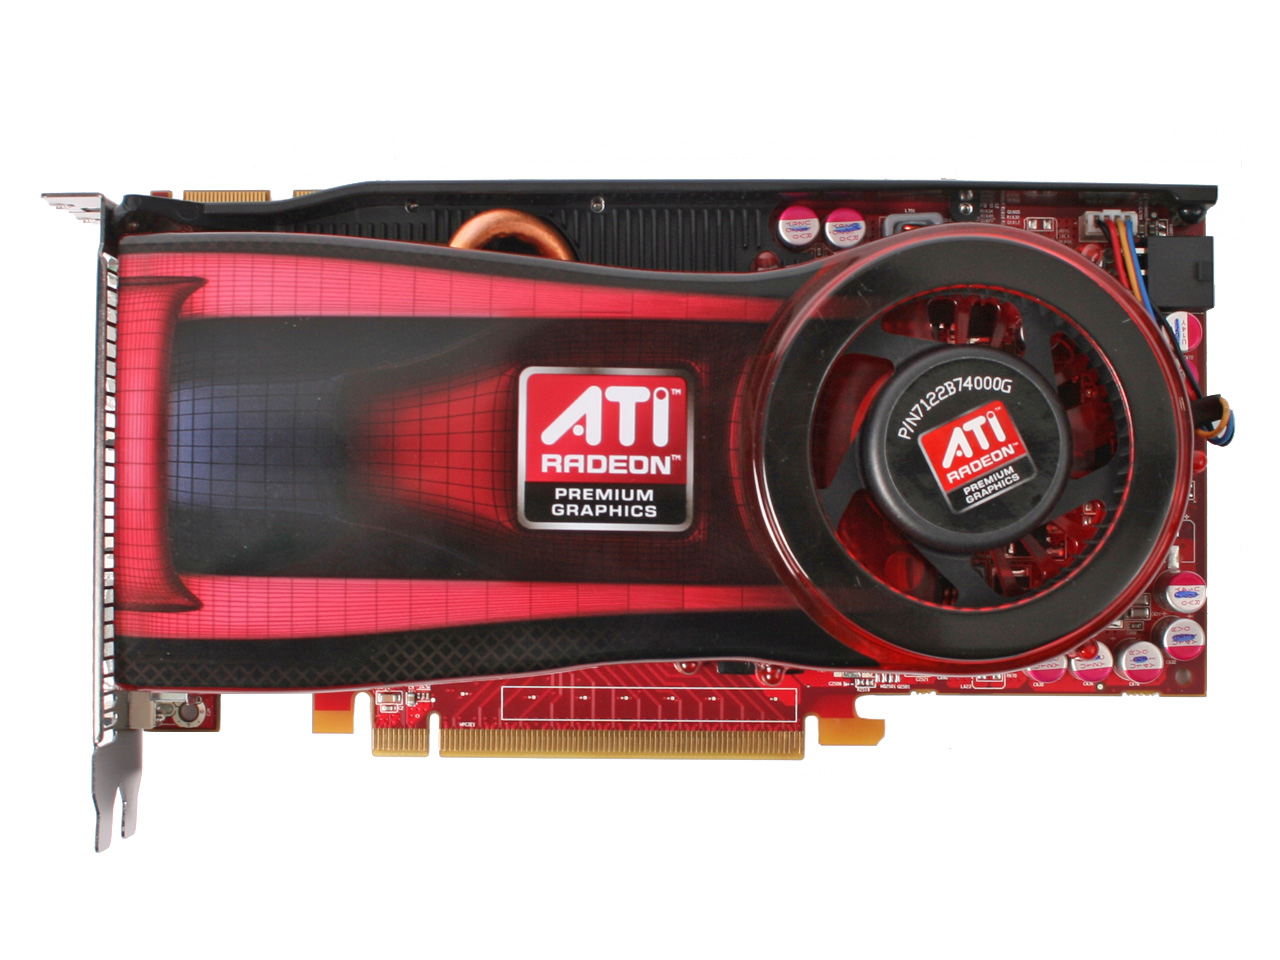 AMD ATI Radeon HD 4770 512MB | bit-tech.net